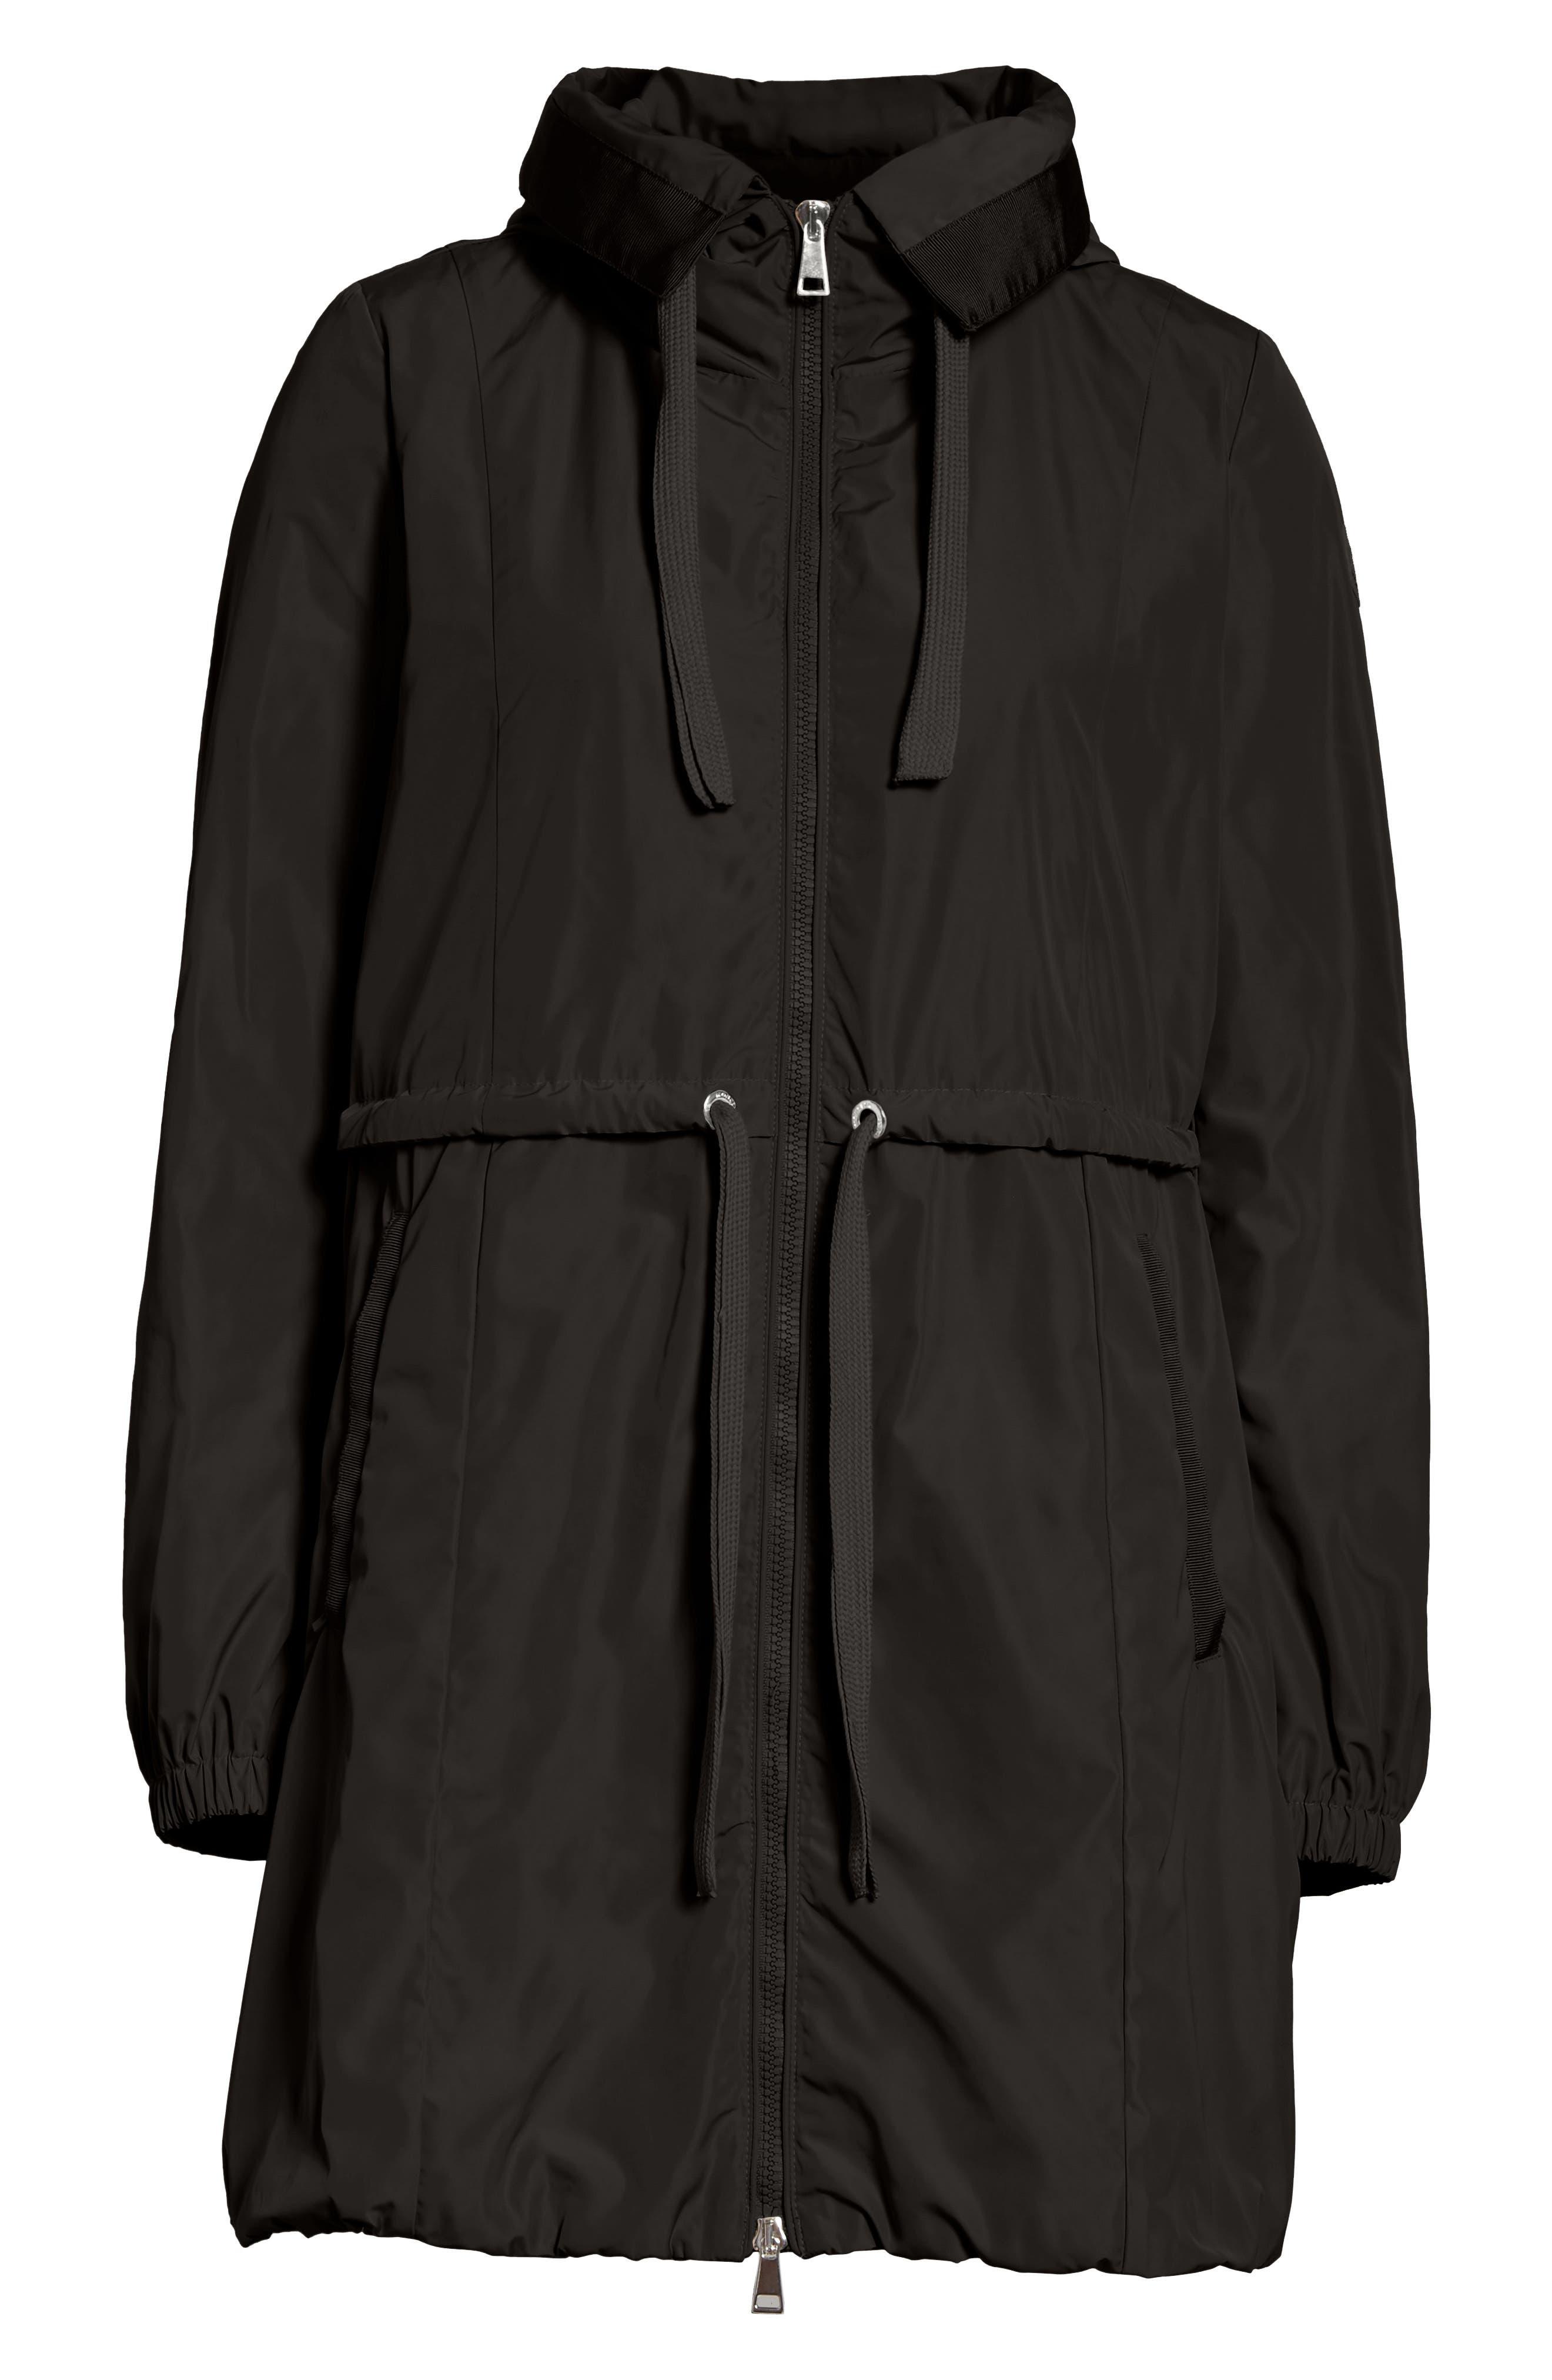 Topaze Water Resistant Hooded Jacket,                             Alternate thumbnail 5, color,                             BLACK